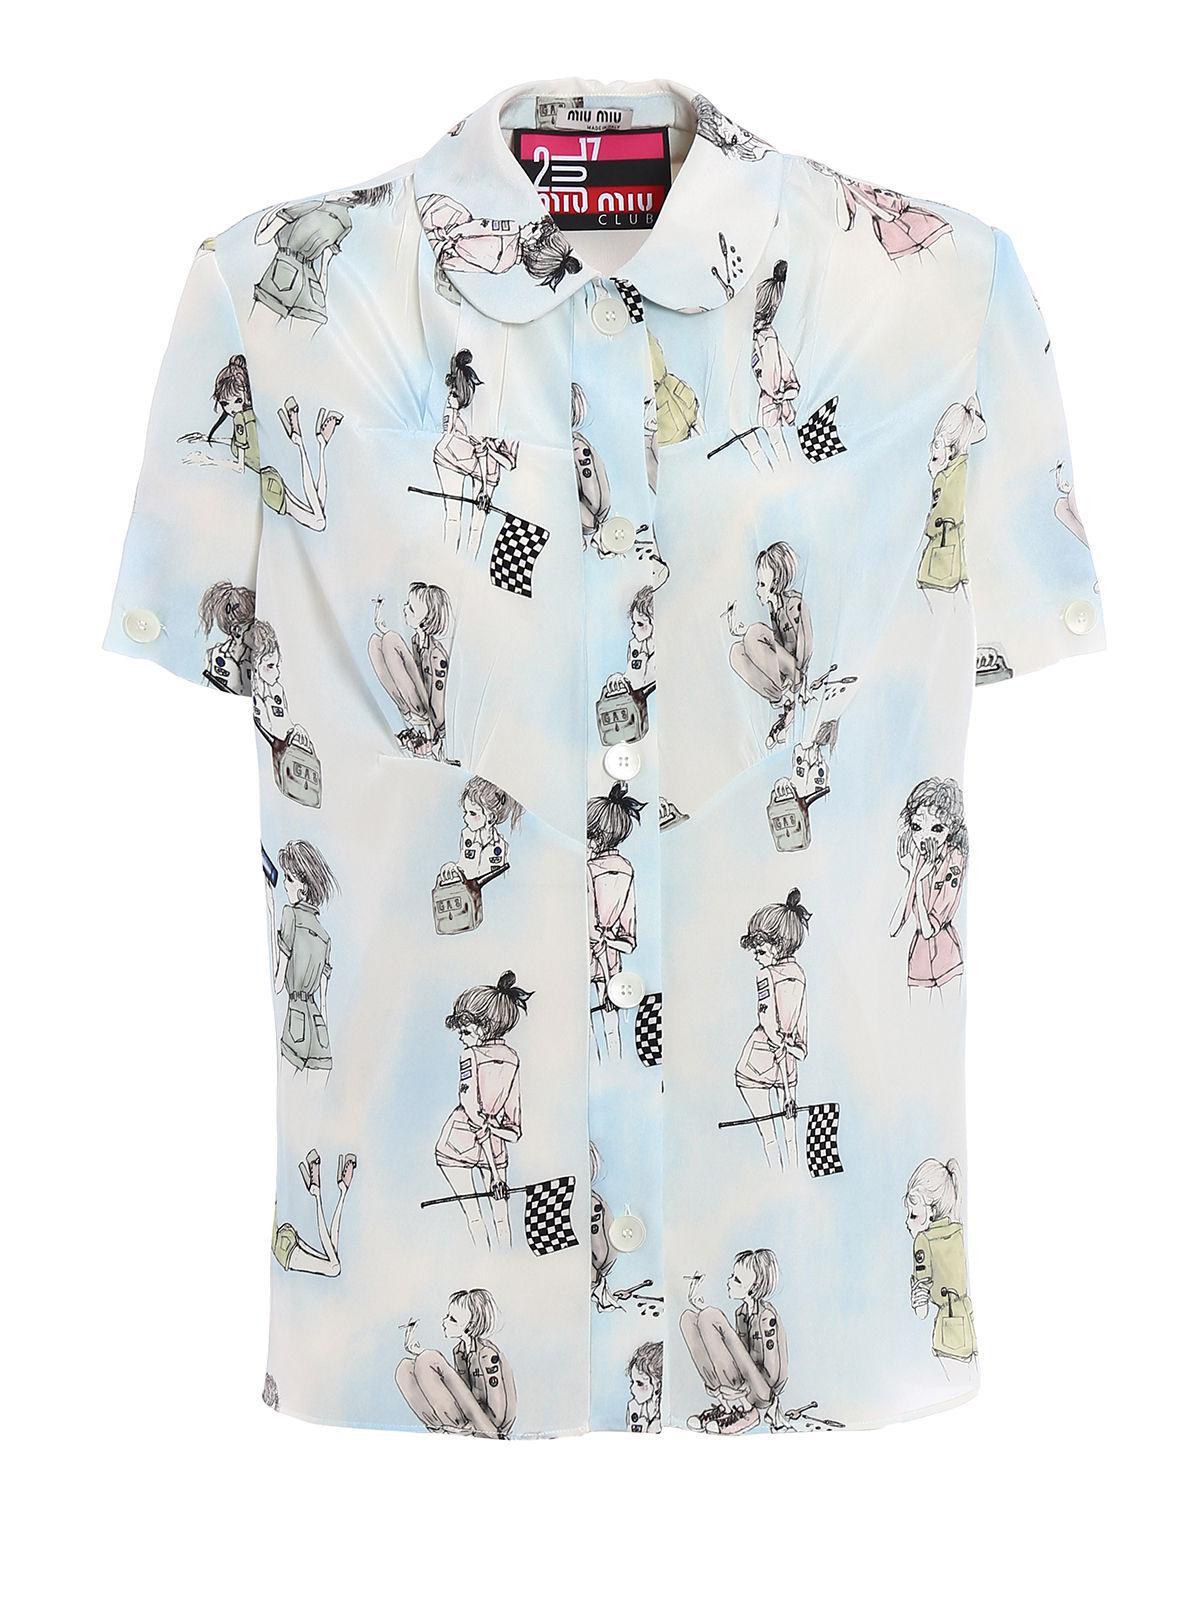 74bbd800d Miu Miu Cdc St.girls Shirt in Blue - Lyst